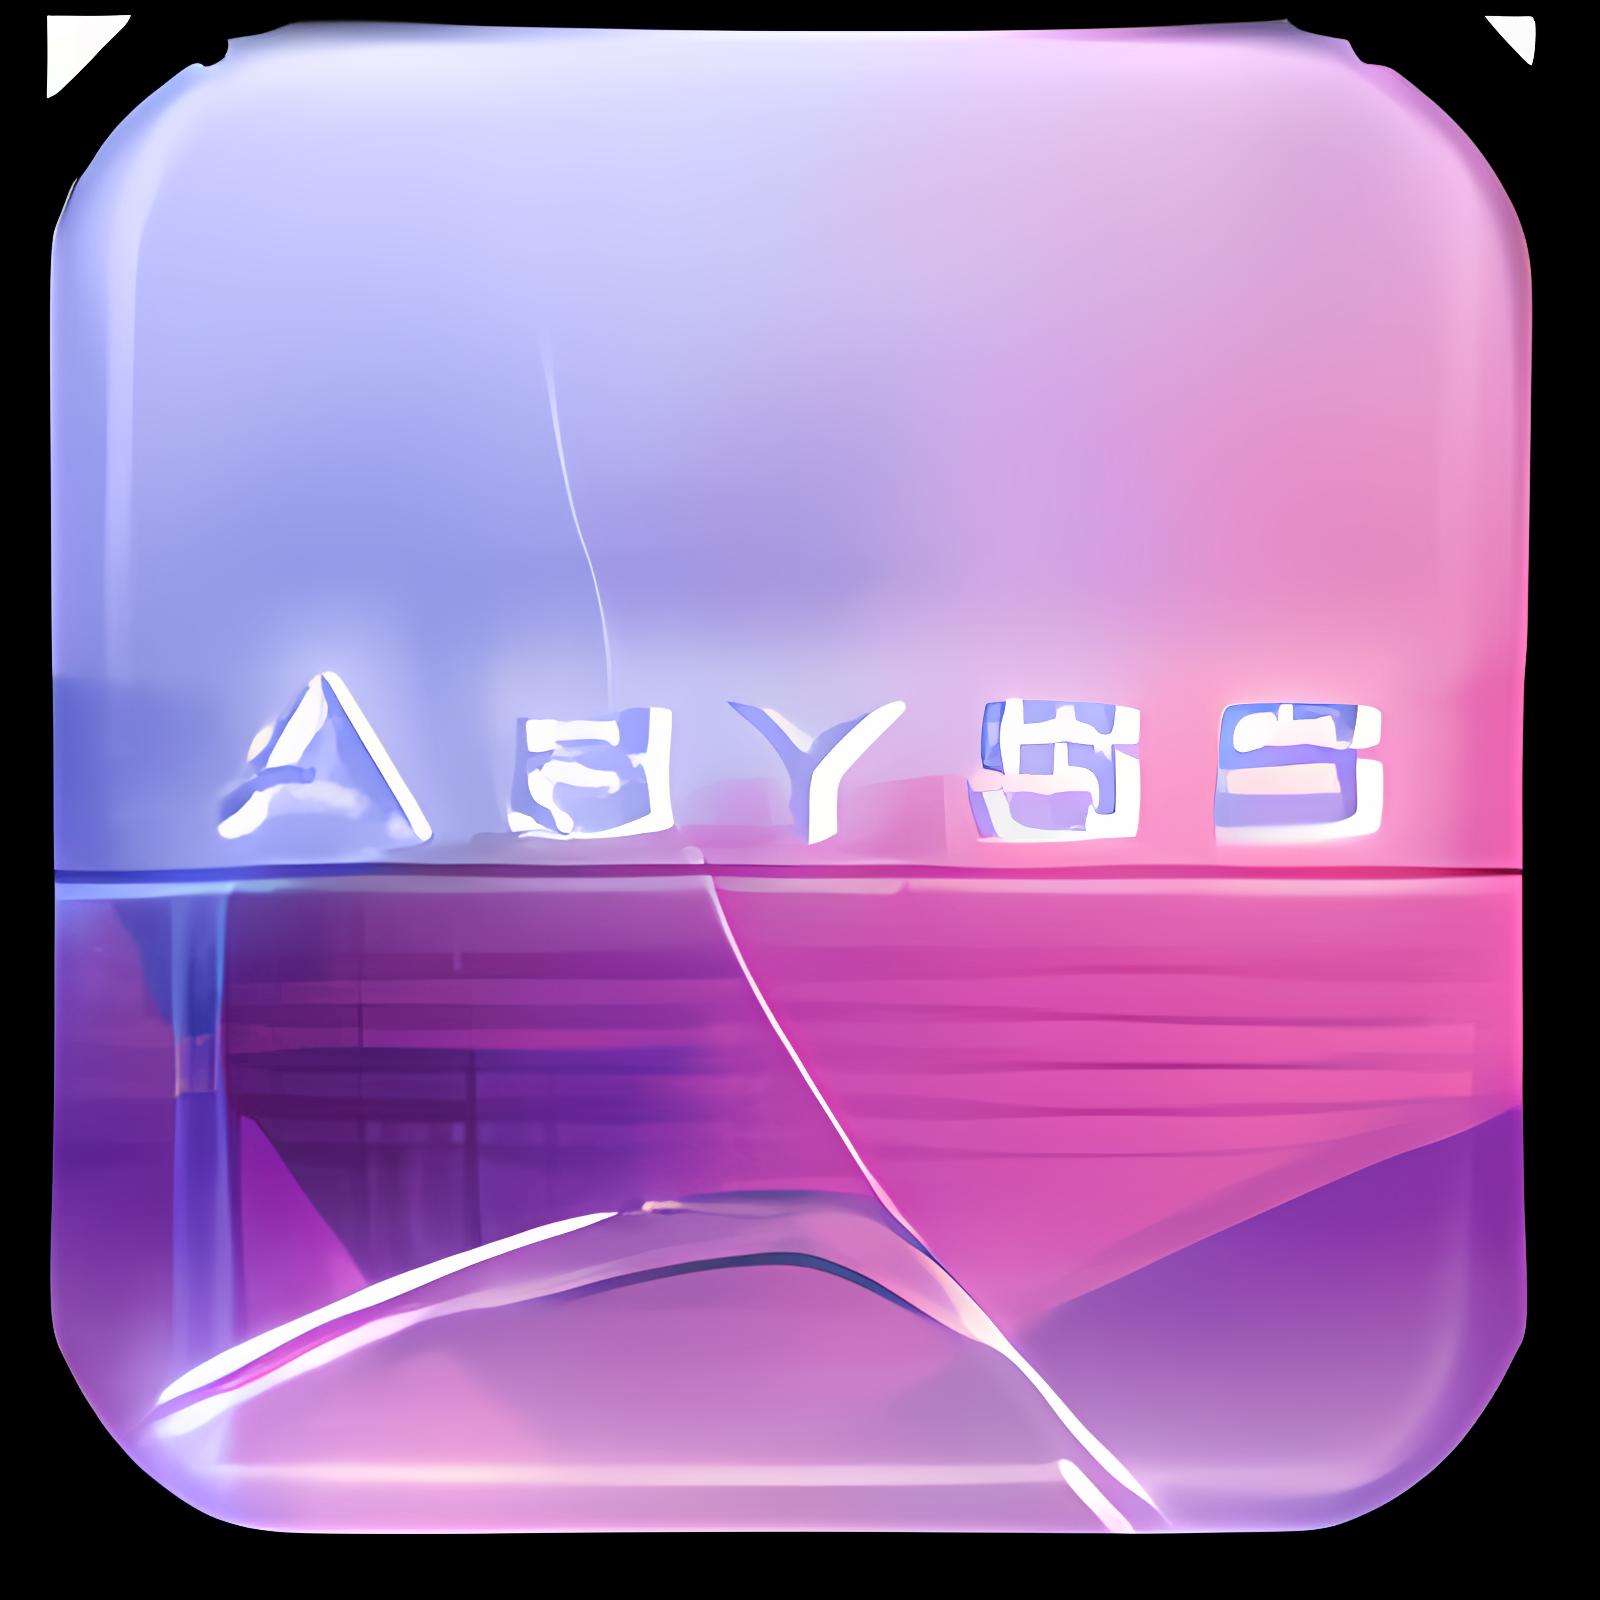 Abyss Wallpaper